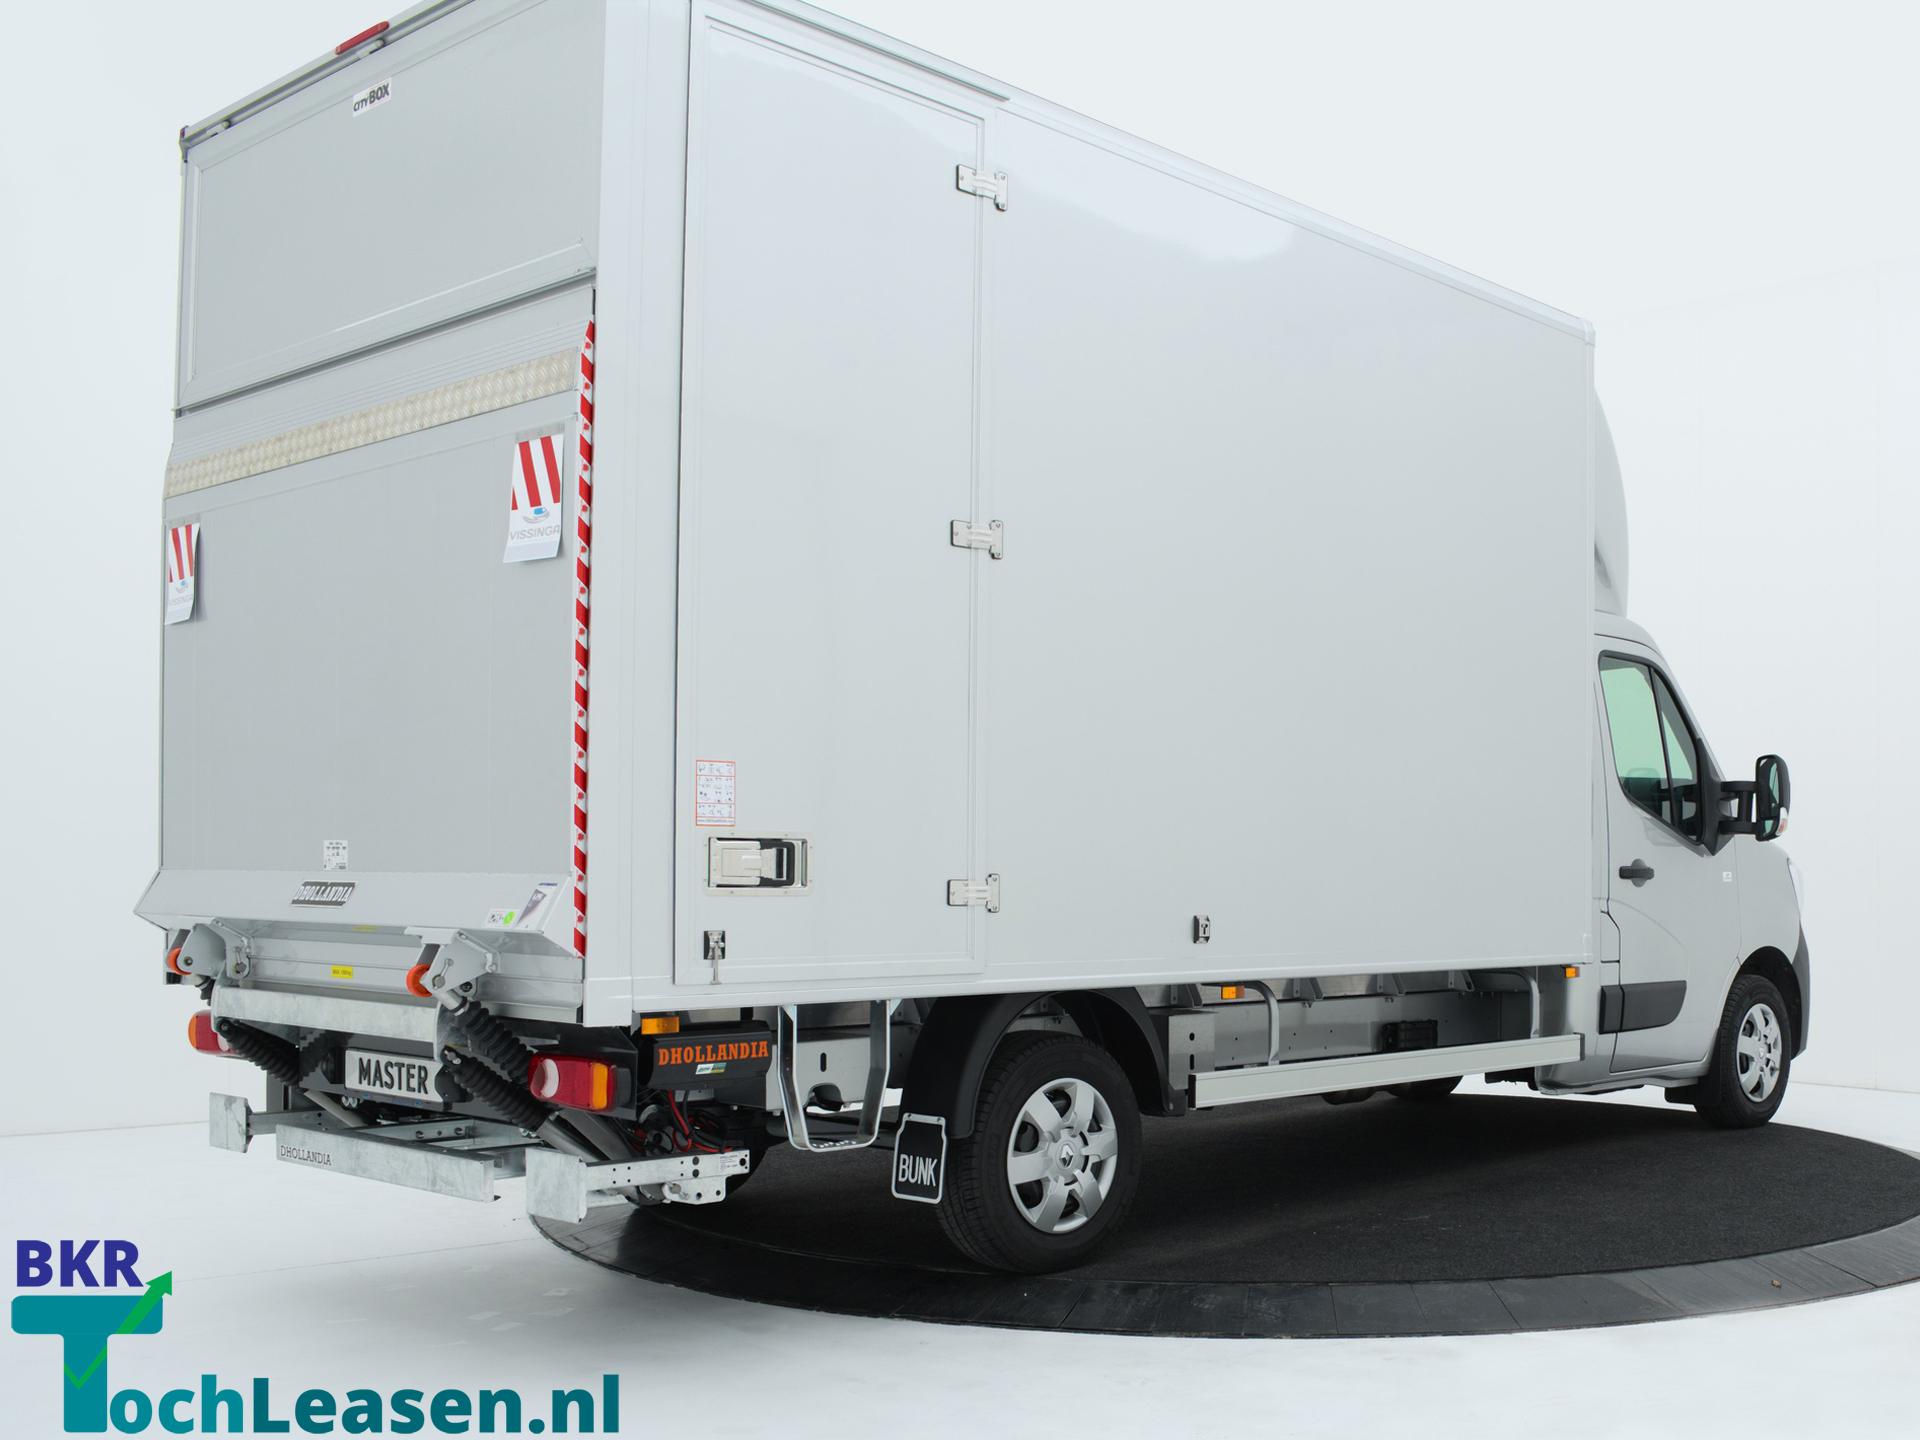 Renault Master bakwagenachterkant zilver BKR toch Leasen